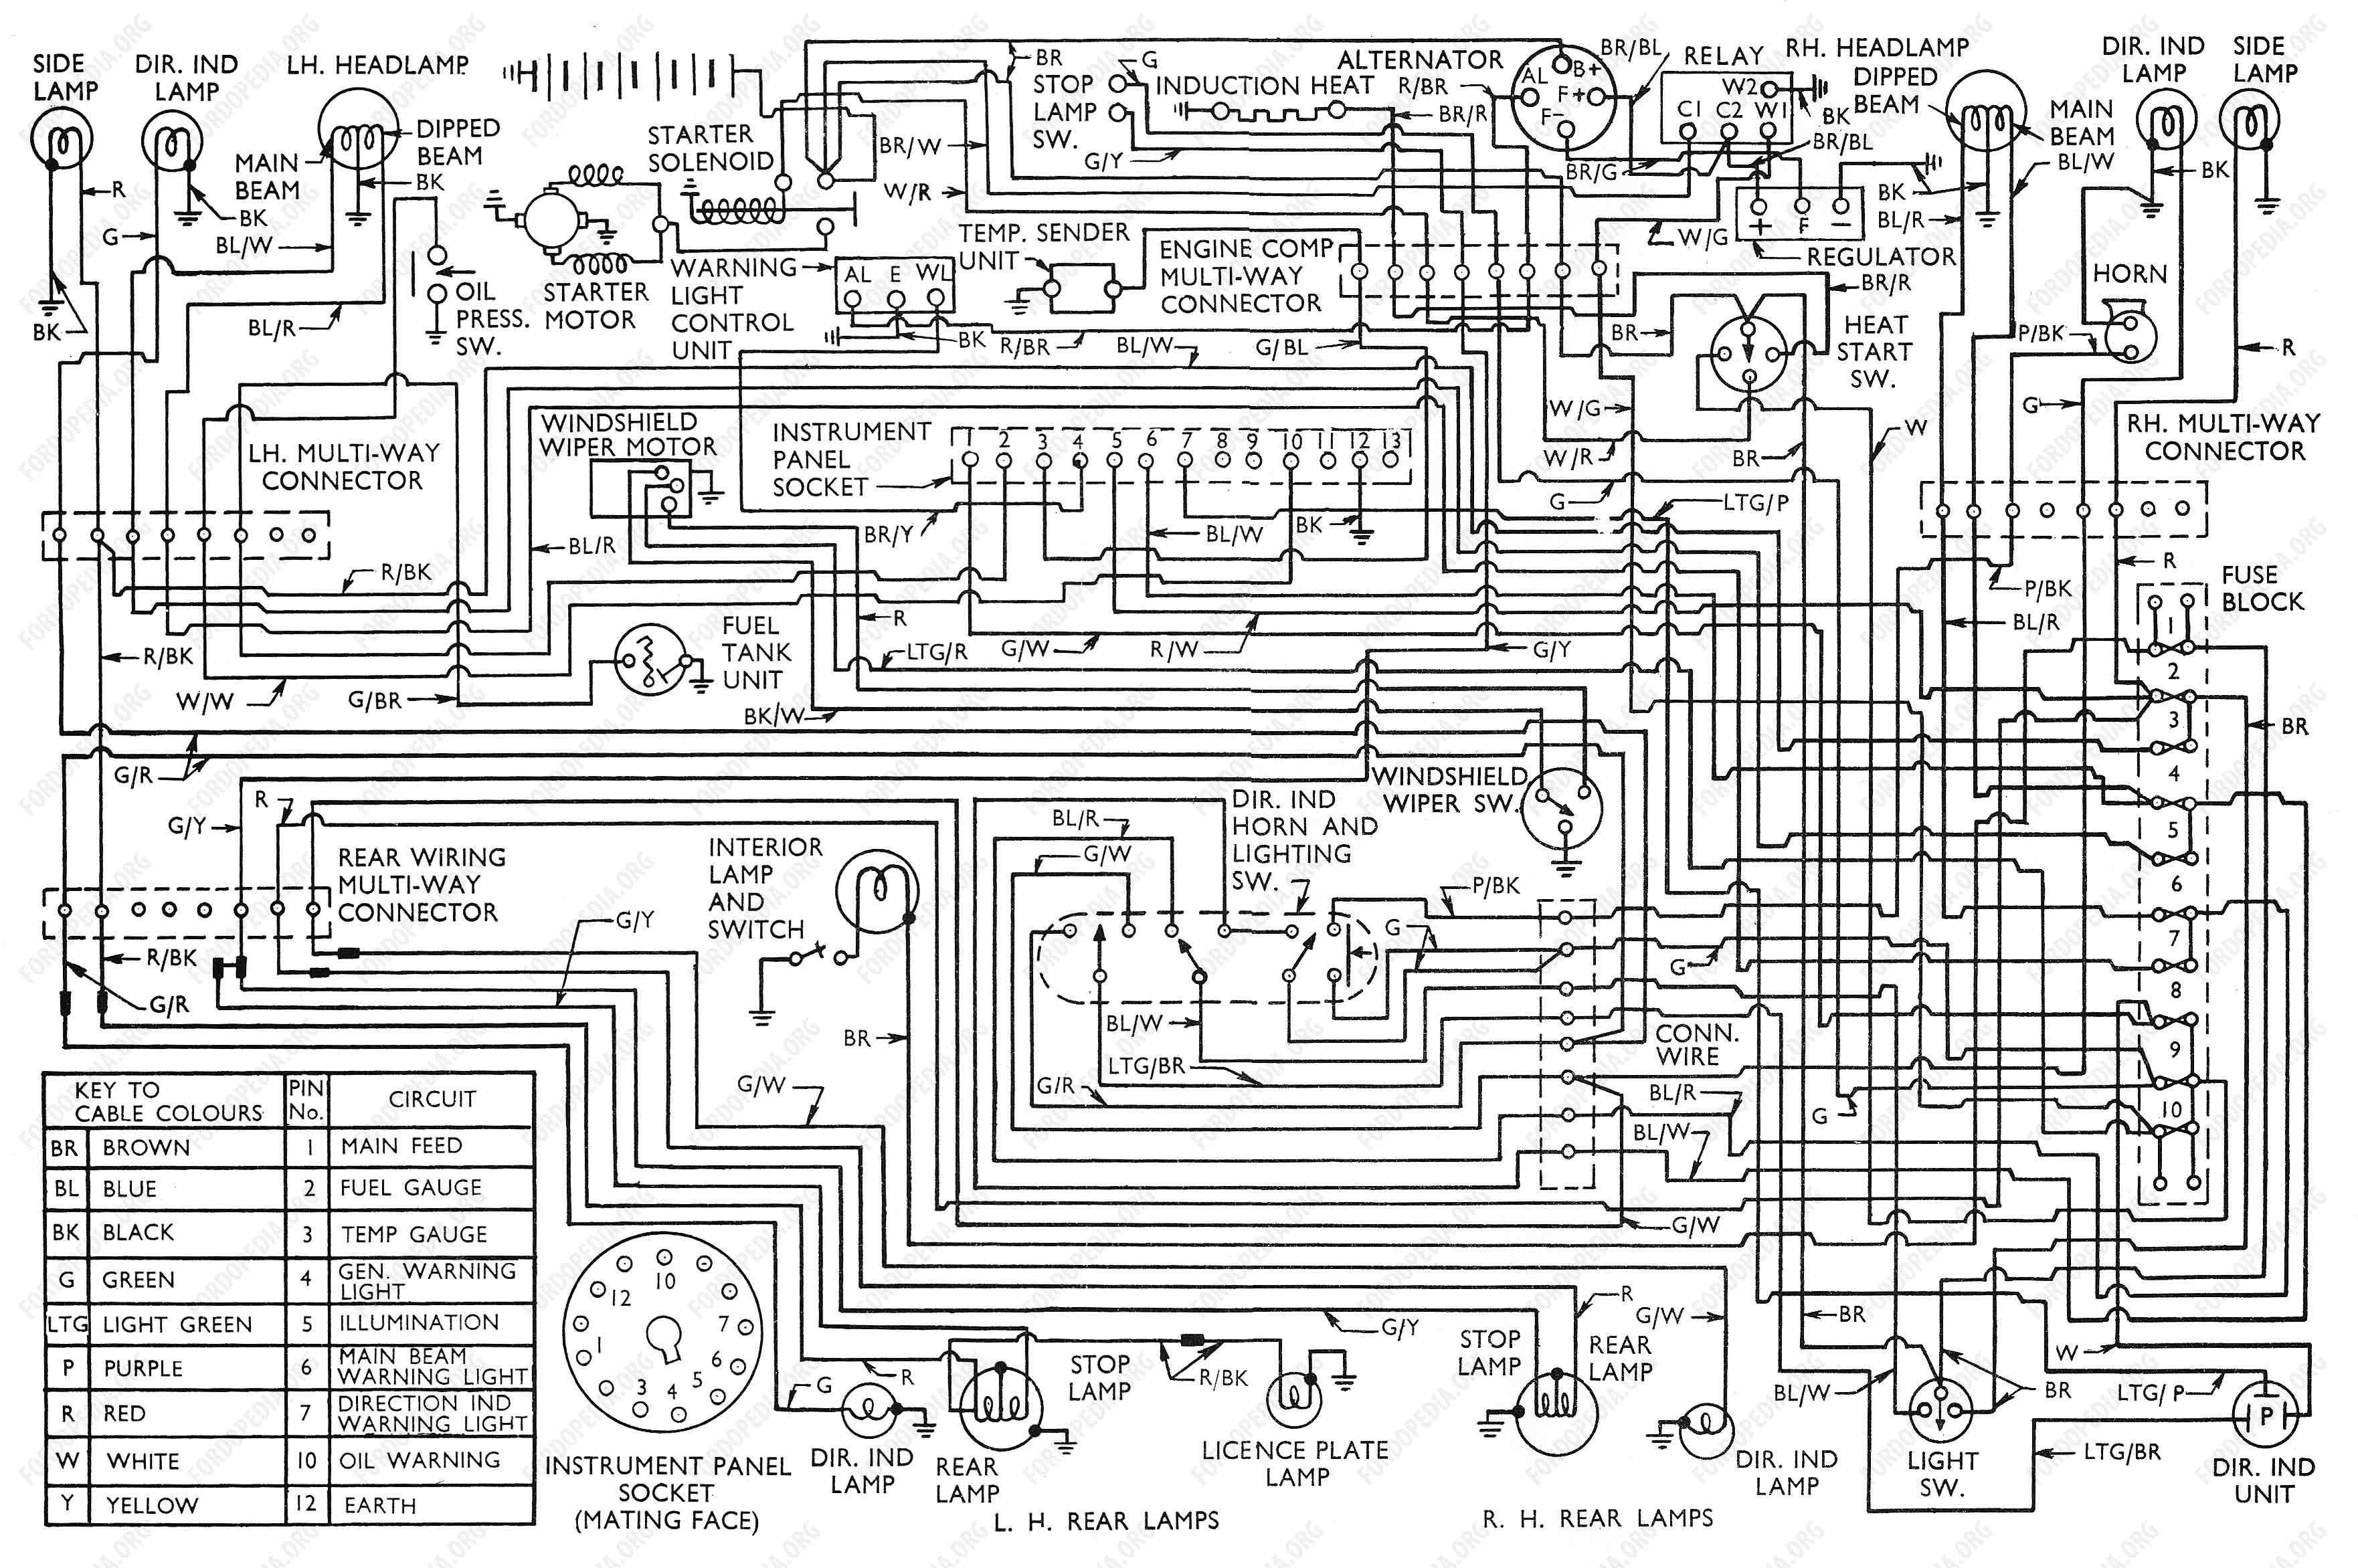 ford bus manuals \u0026 wiring diagrams pdf bus \u0026 coach manuals Ford Transit Wiring Diagram Ford Transit Wiring Diagram #3